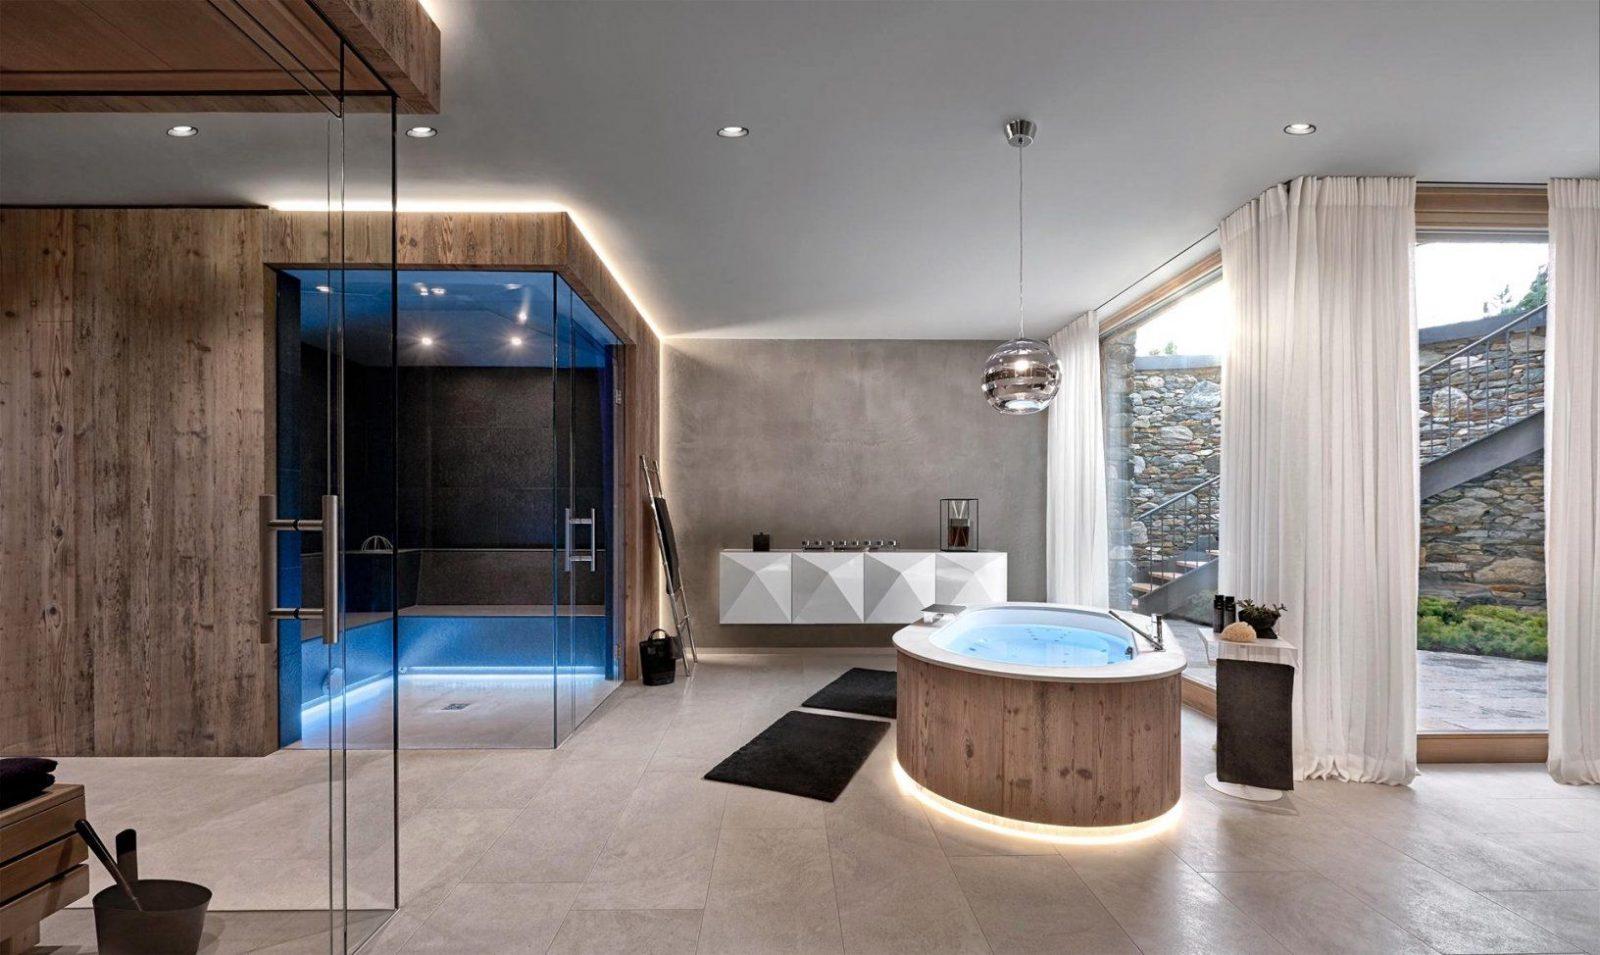 Charmant Luxus Badezimmer Mit Whirlpool  Kpelavrio von Luxus Badezimmer Mit Whirlpool Photo